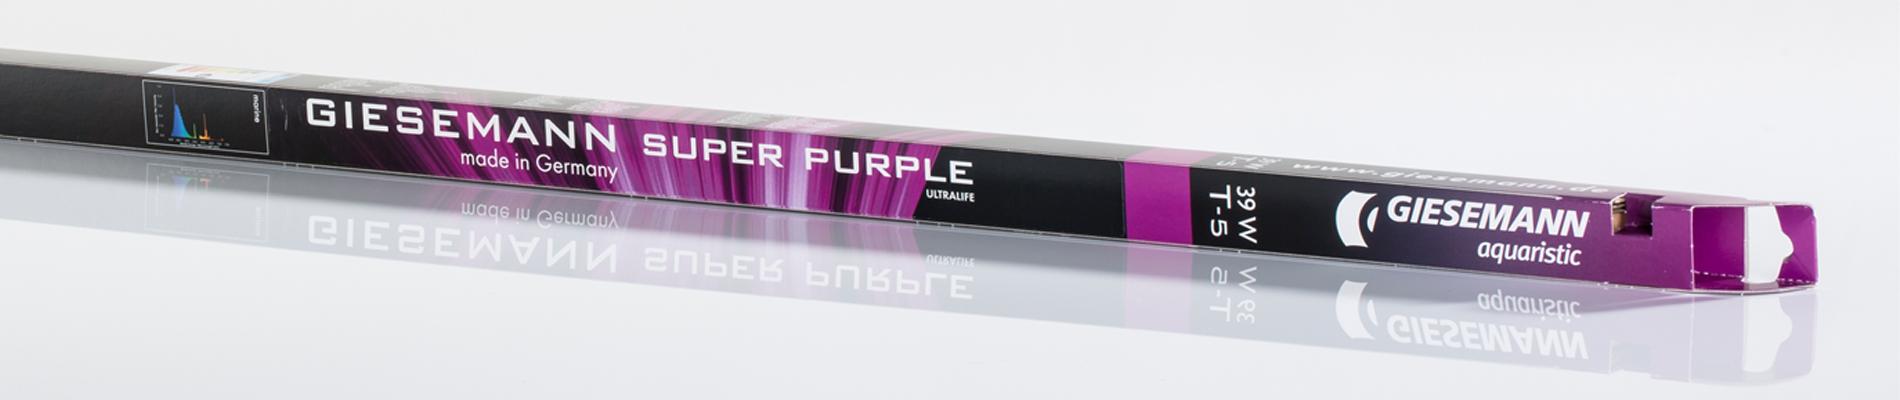 t5 tl powerchrome super purple giesemann